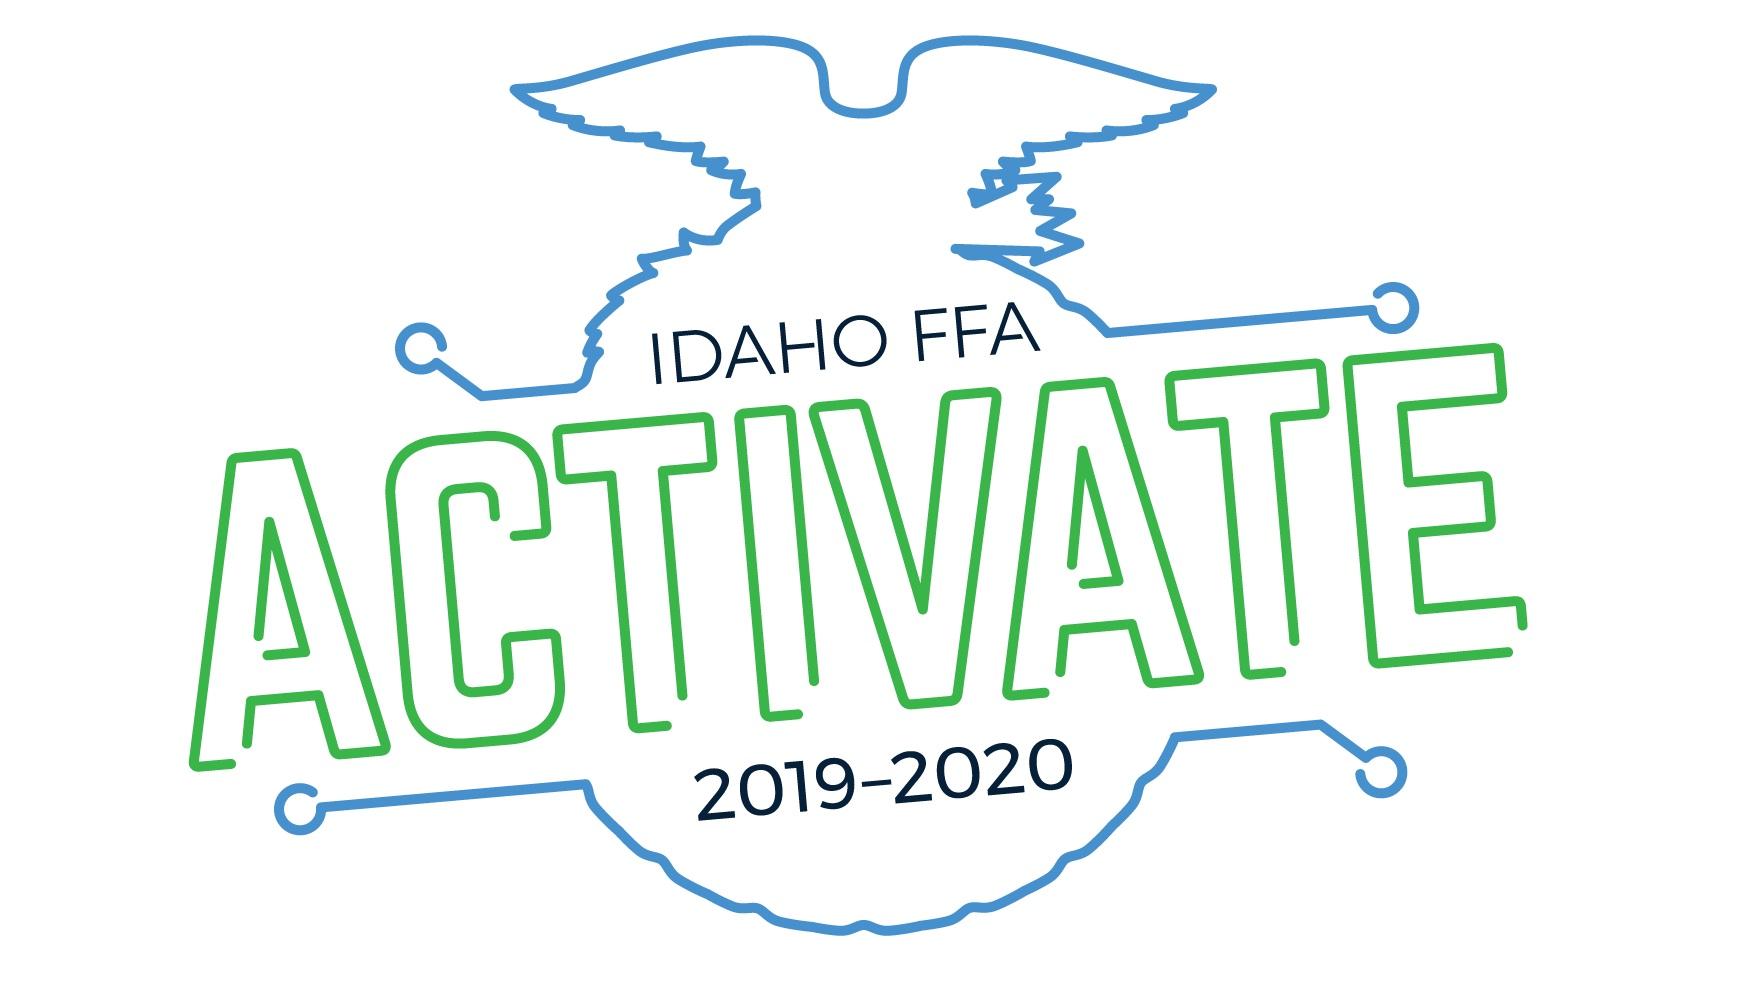 Idaho+FFA+Logo+19-20+02+flat+color+on+white%402x.jpg